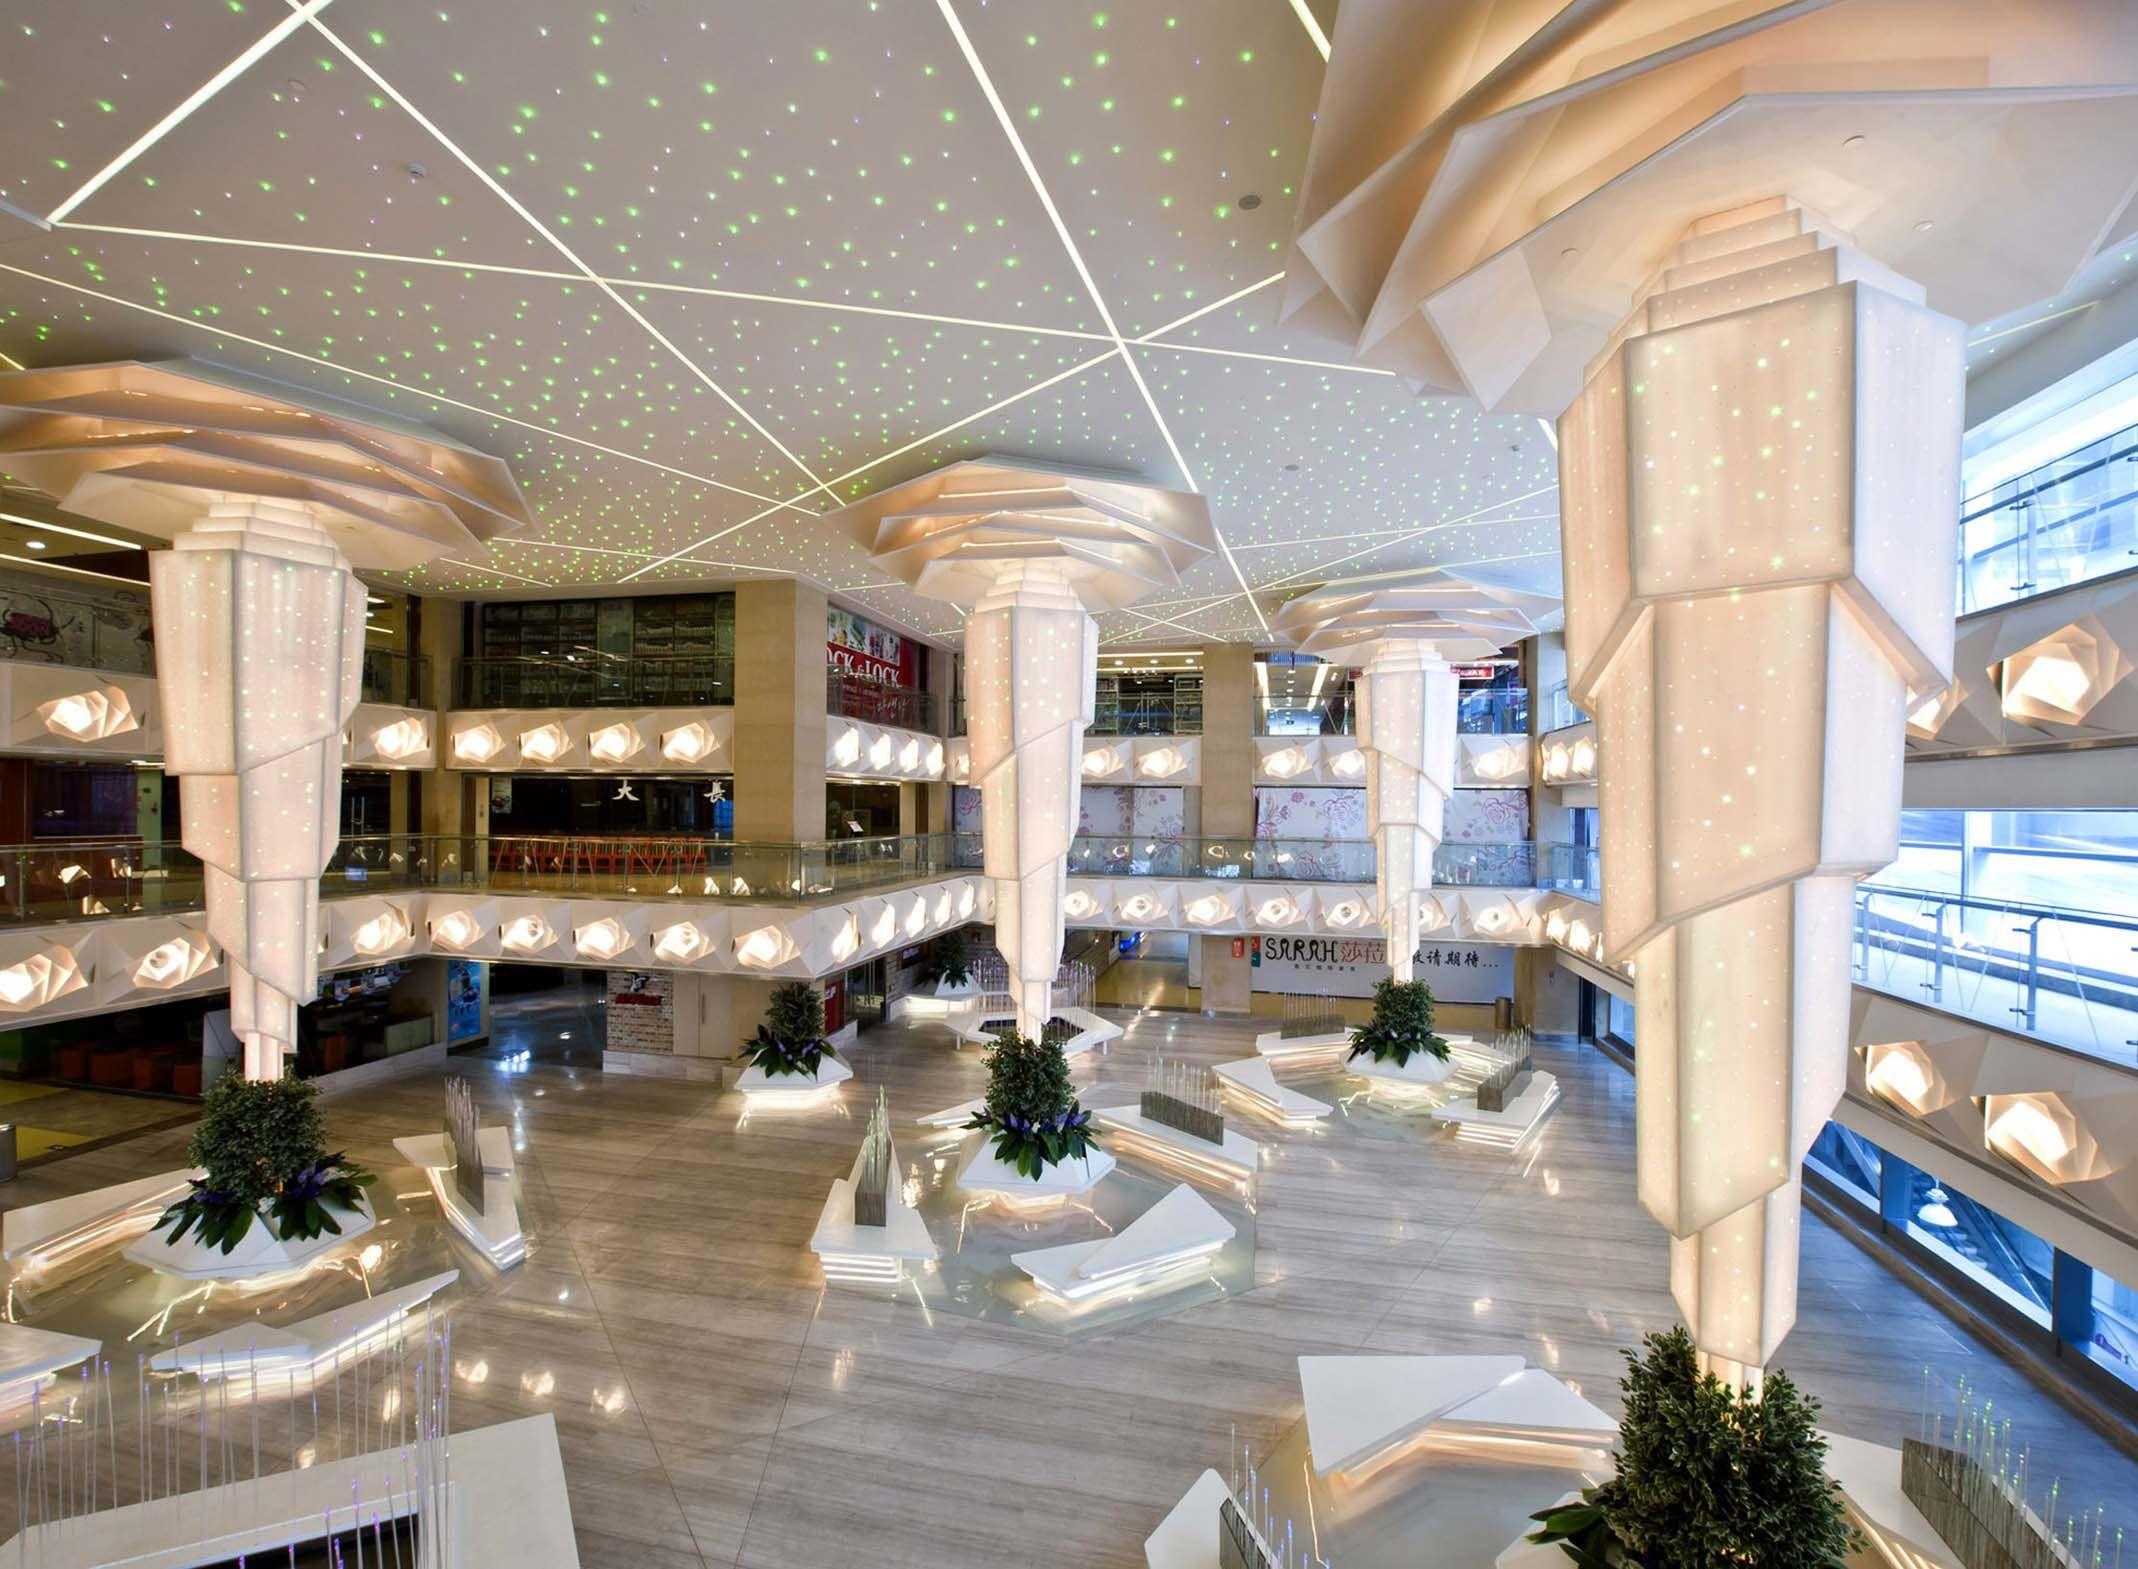 Galleries | Spark Awards | Atriums & Concourses in 2019